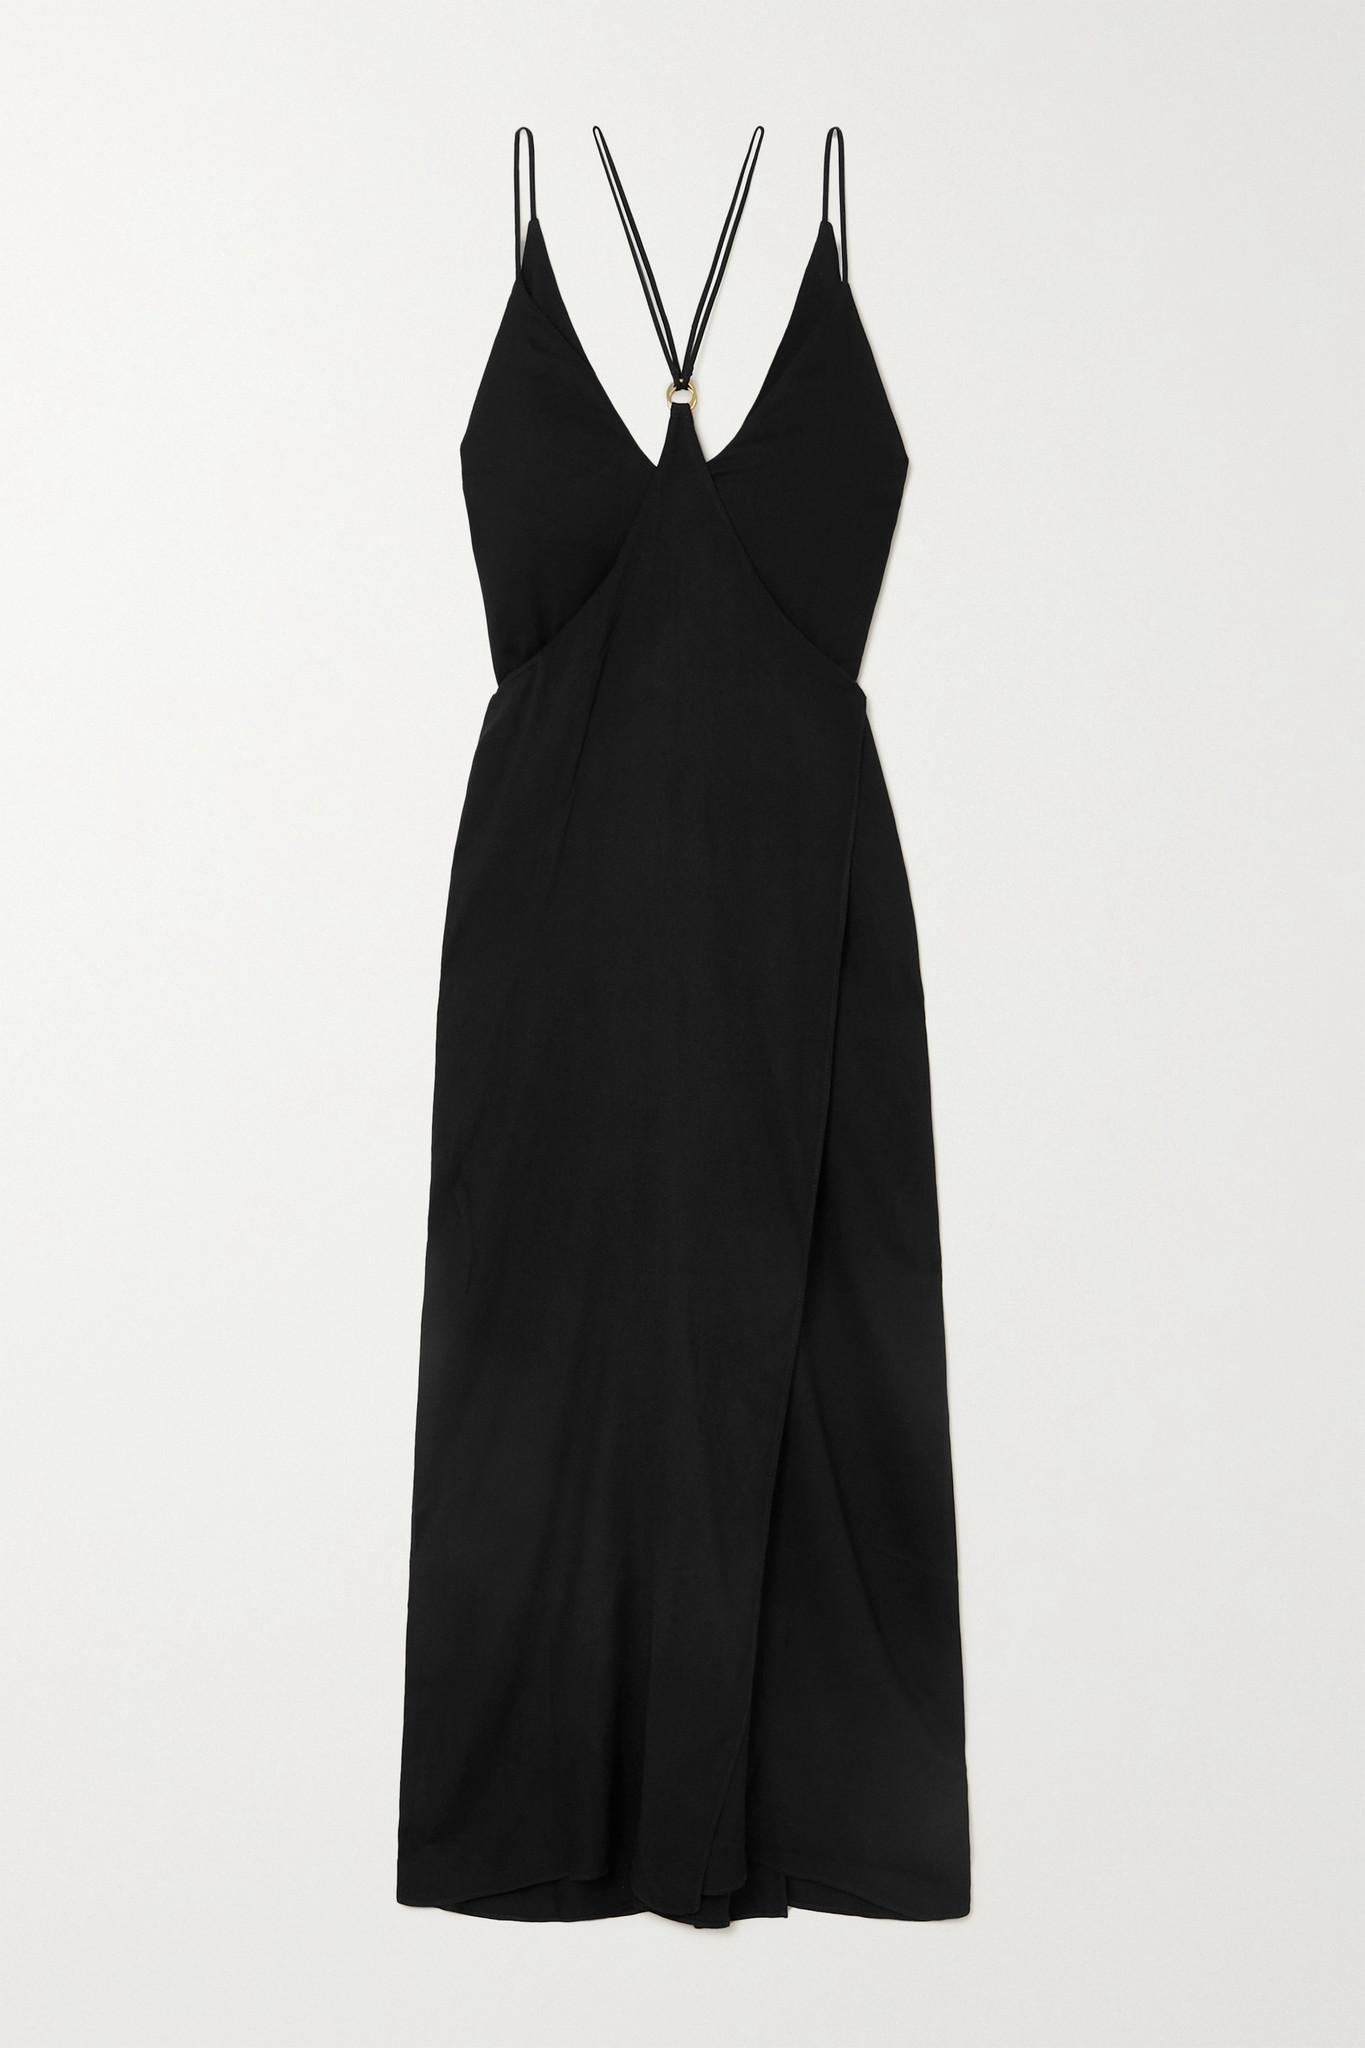 MARIKA VERA - Perdita 多种穿法带缀饰平纹布超长连衣裙 - 黑色 - medium